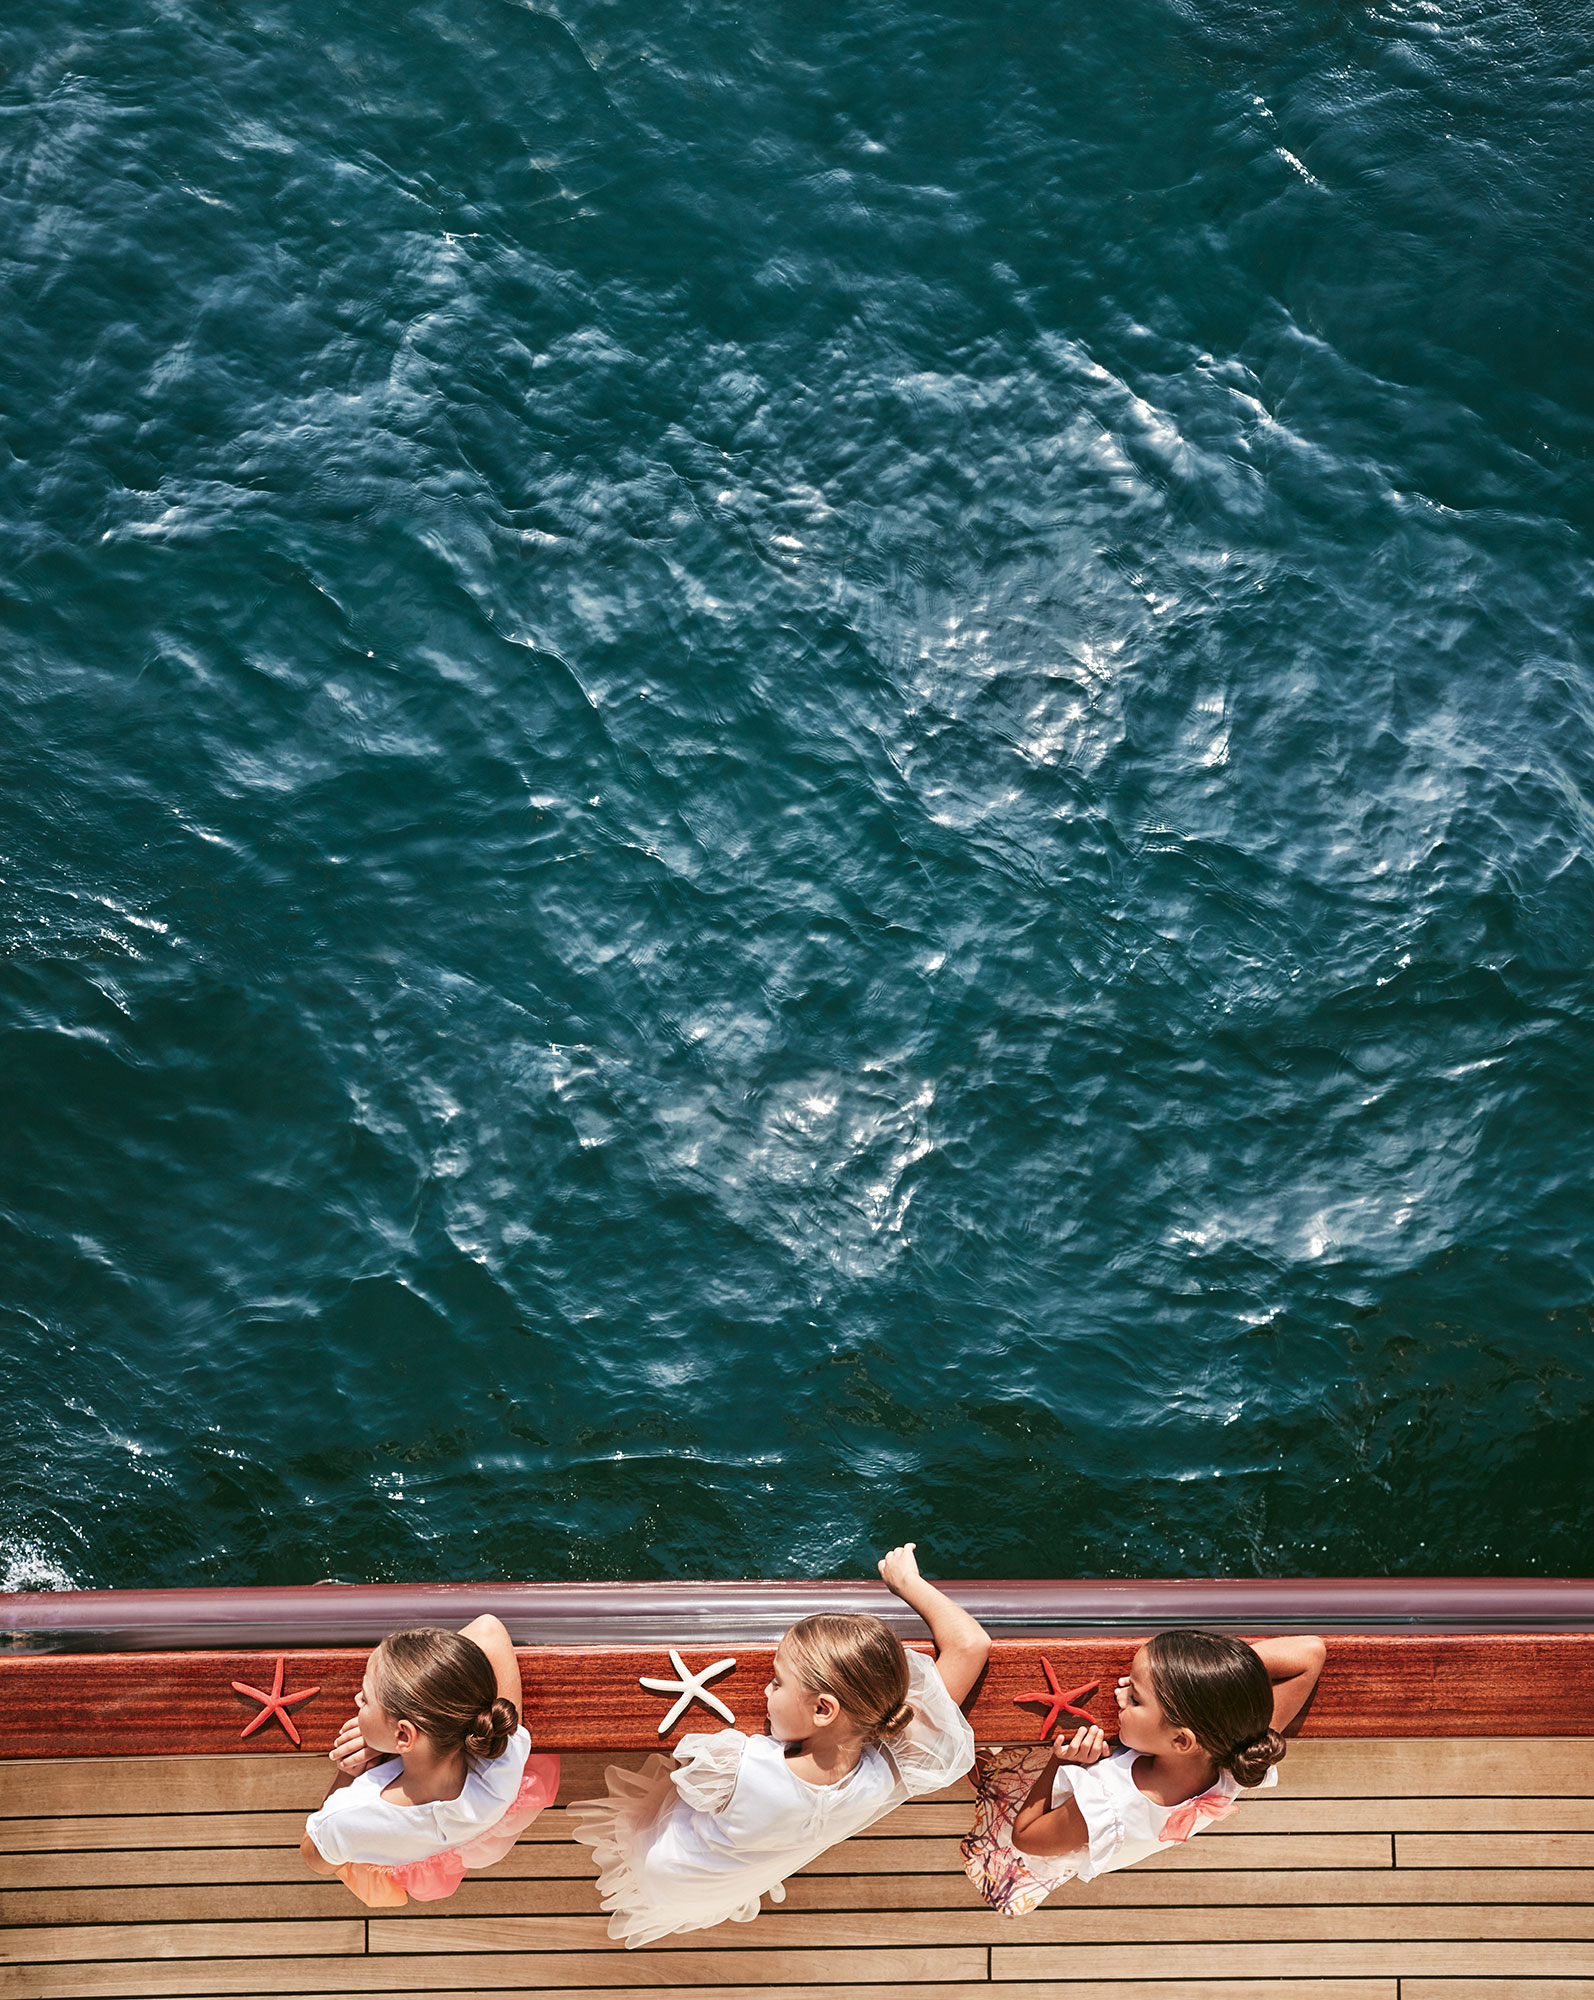 Il Gufo Spring Summer 2019 | Serge Guerand | Il Gufo | Vanity Fair Italia | Sarah Grittini | Numerique Retouch Photo Retouching Studio